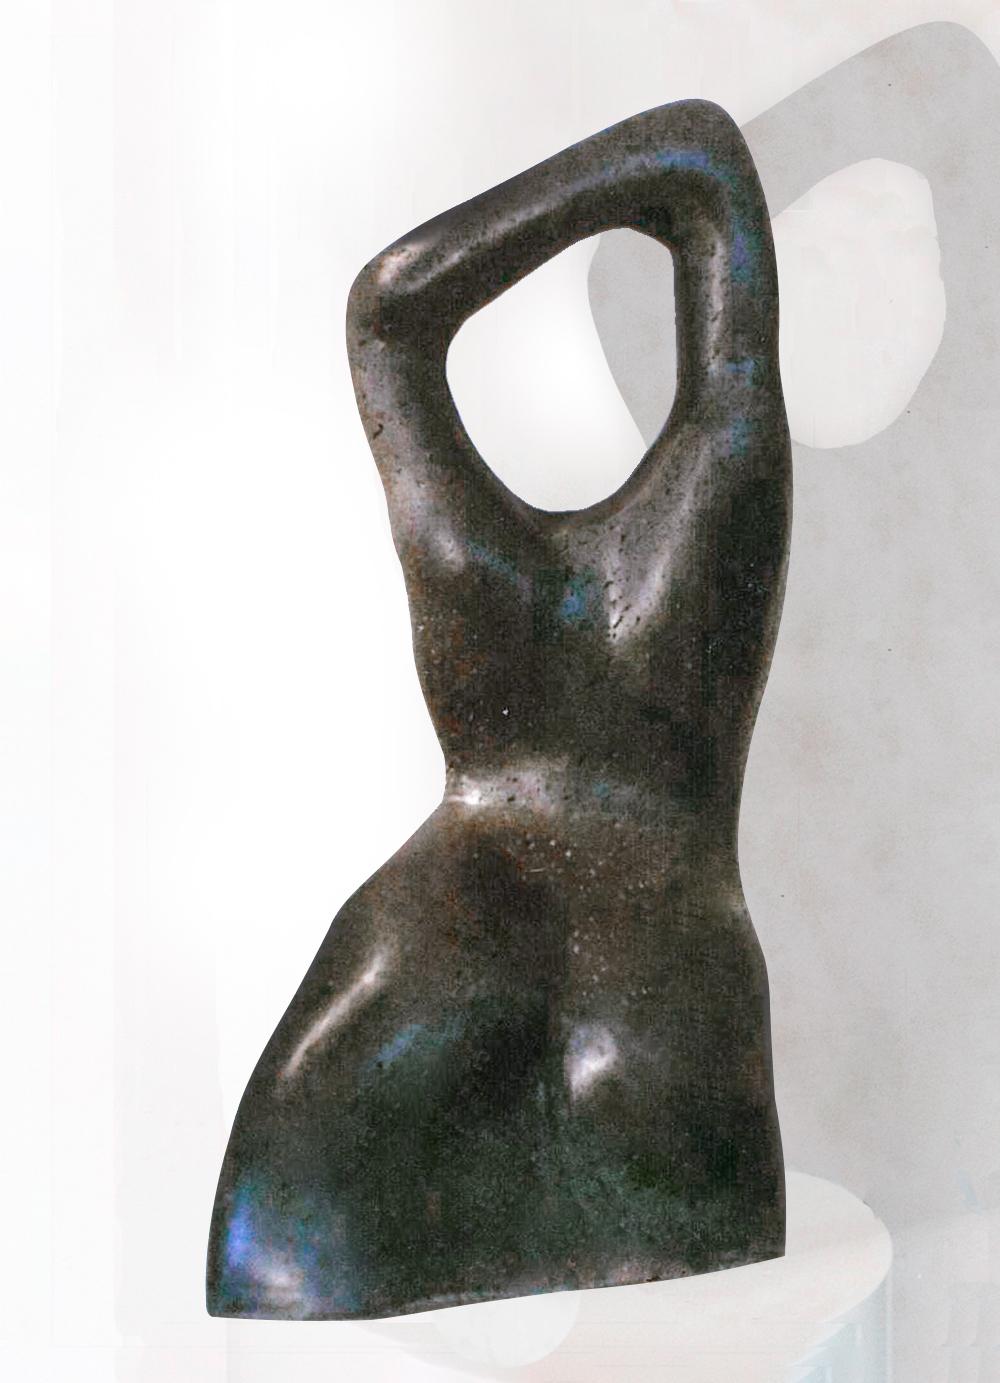 Escultura-Torso-Femenino-Basalto-B-Figurativo-Abstracto-RD.Escultor